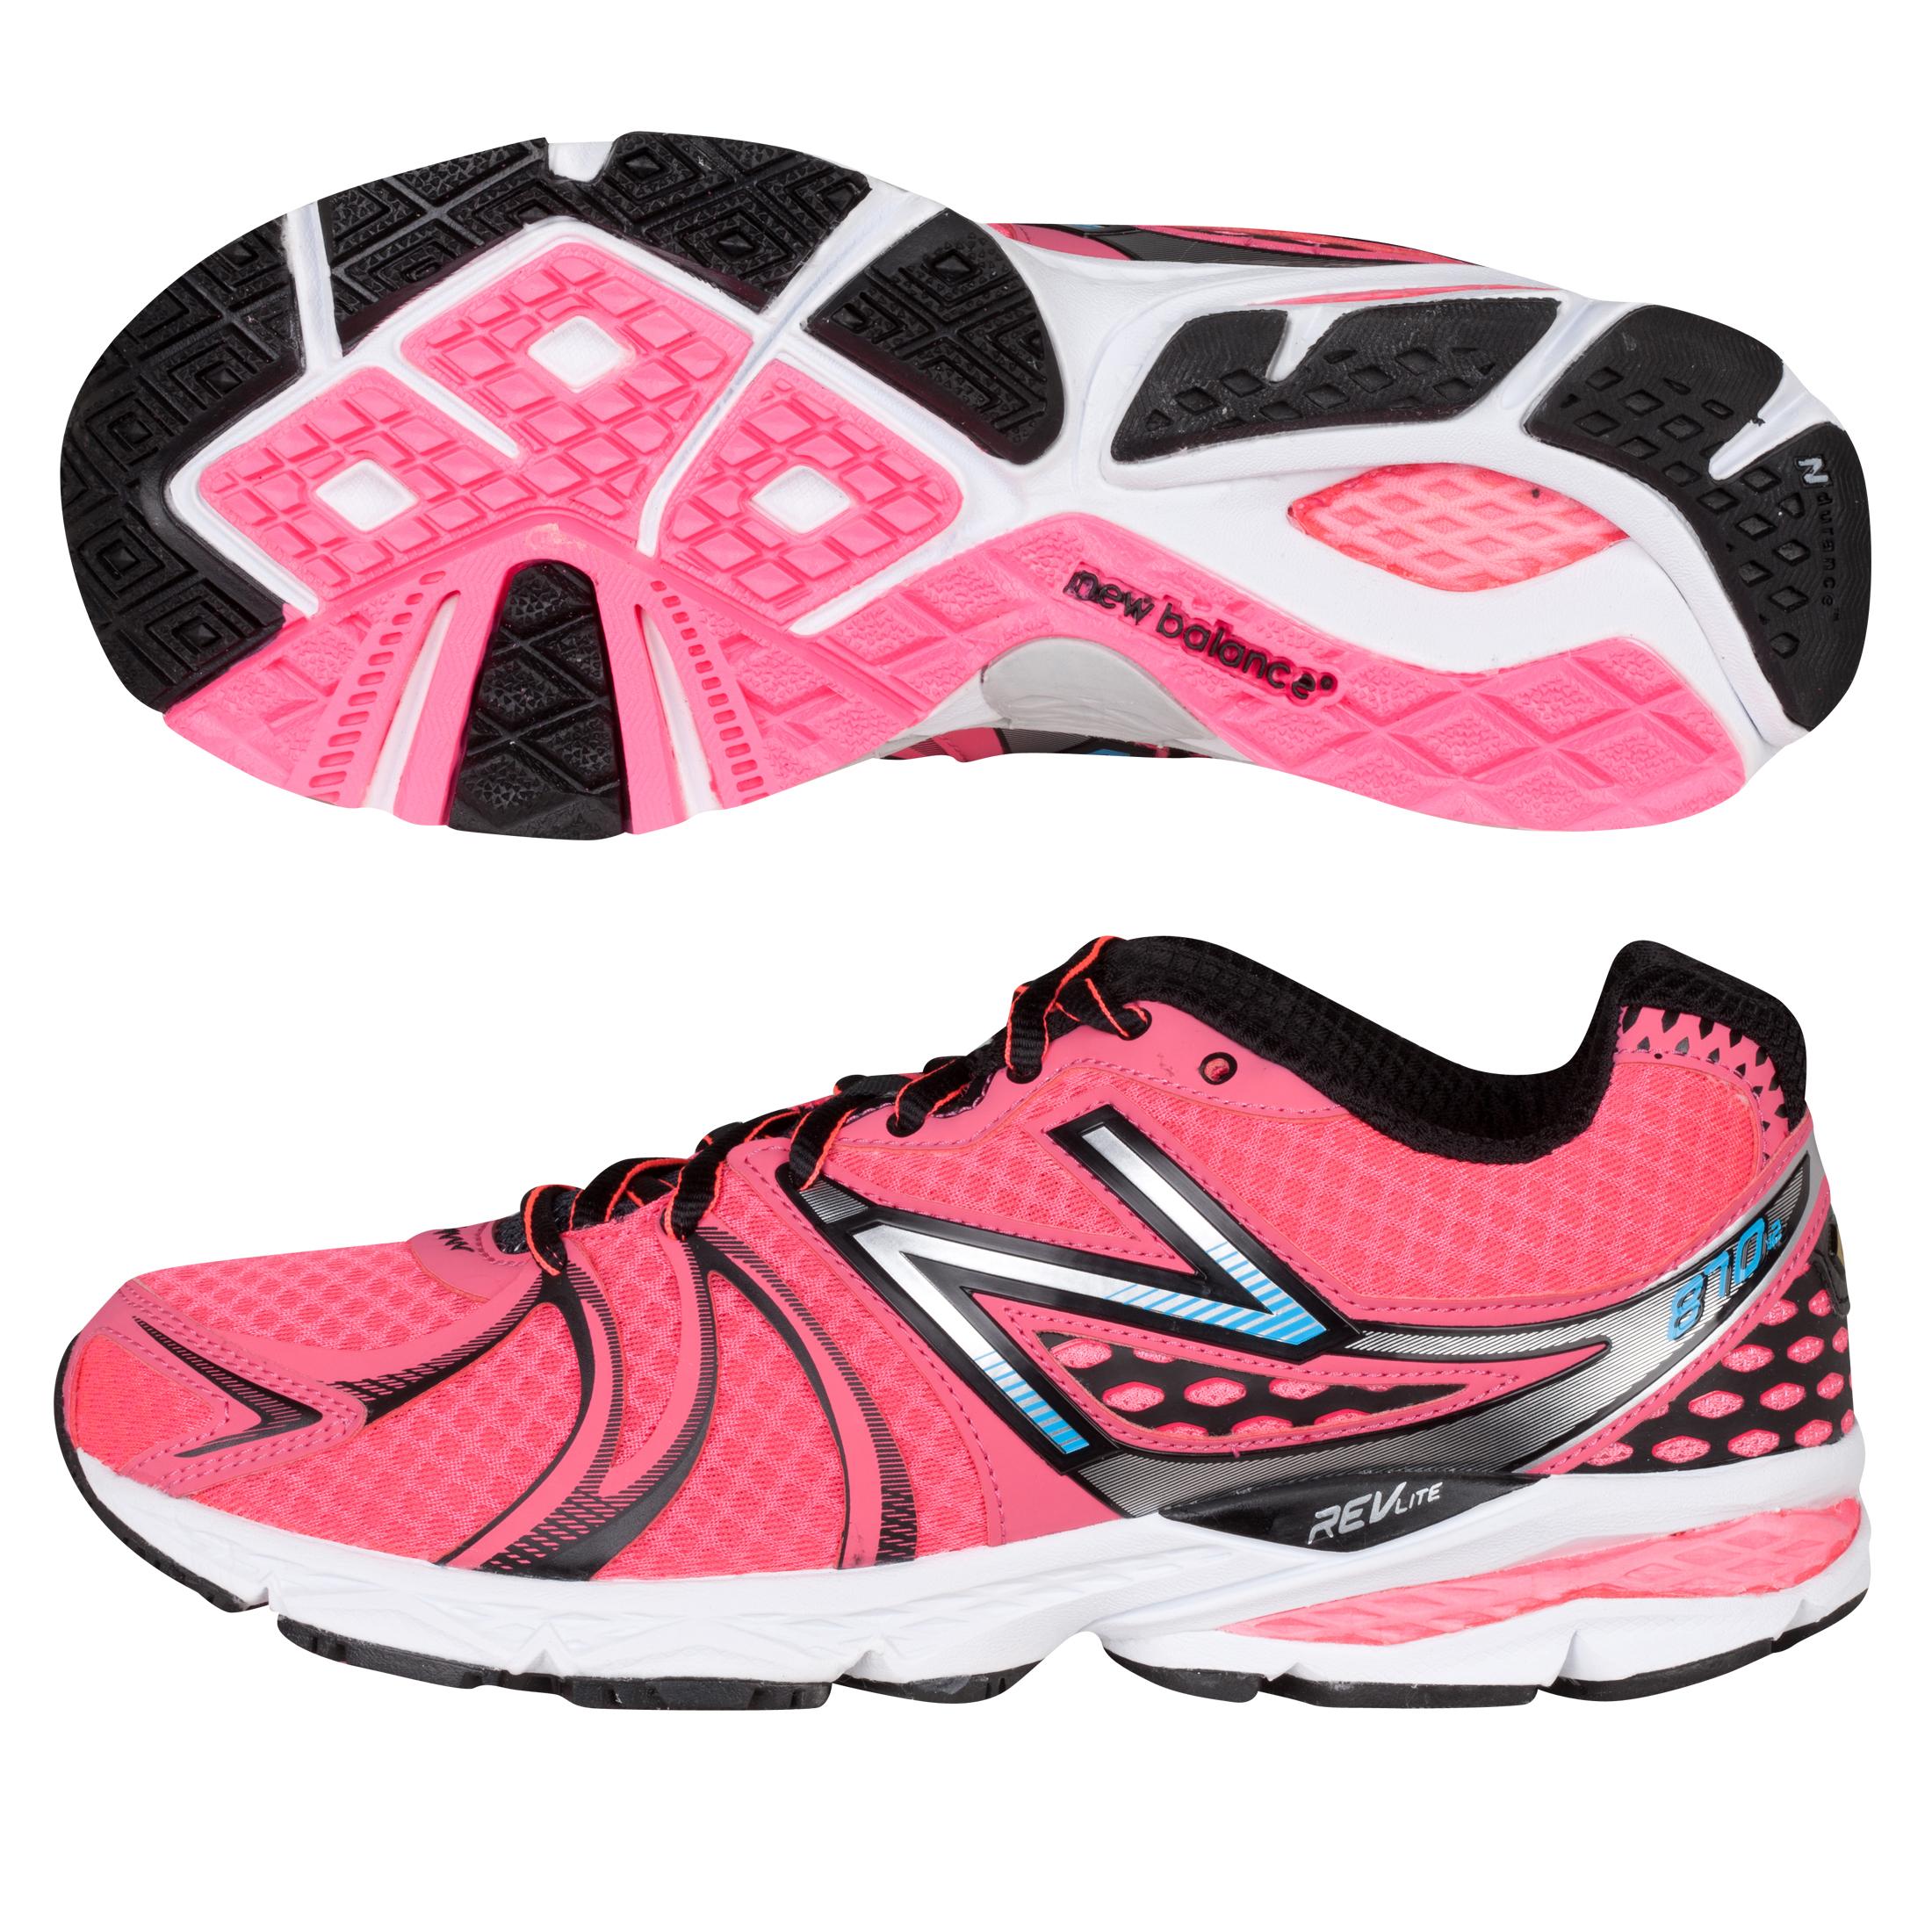 New Balance 870V2 Trainer - Pink Black - Womens